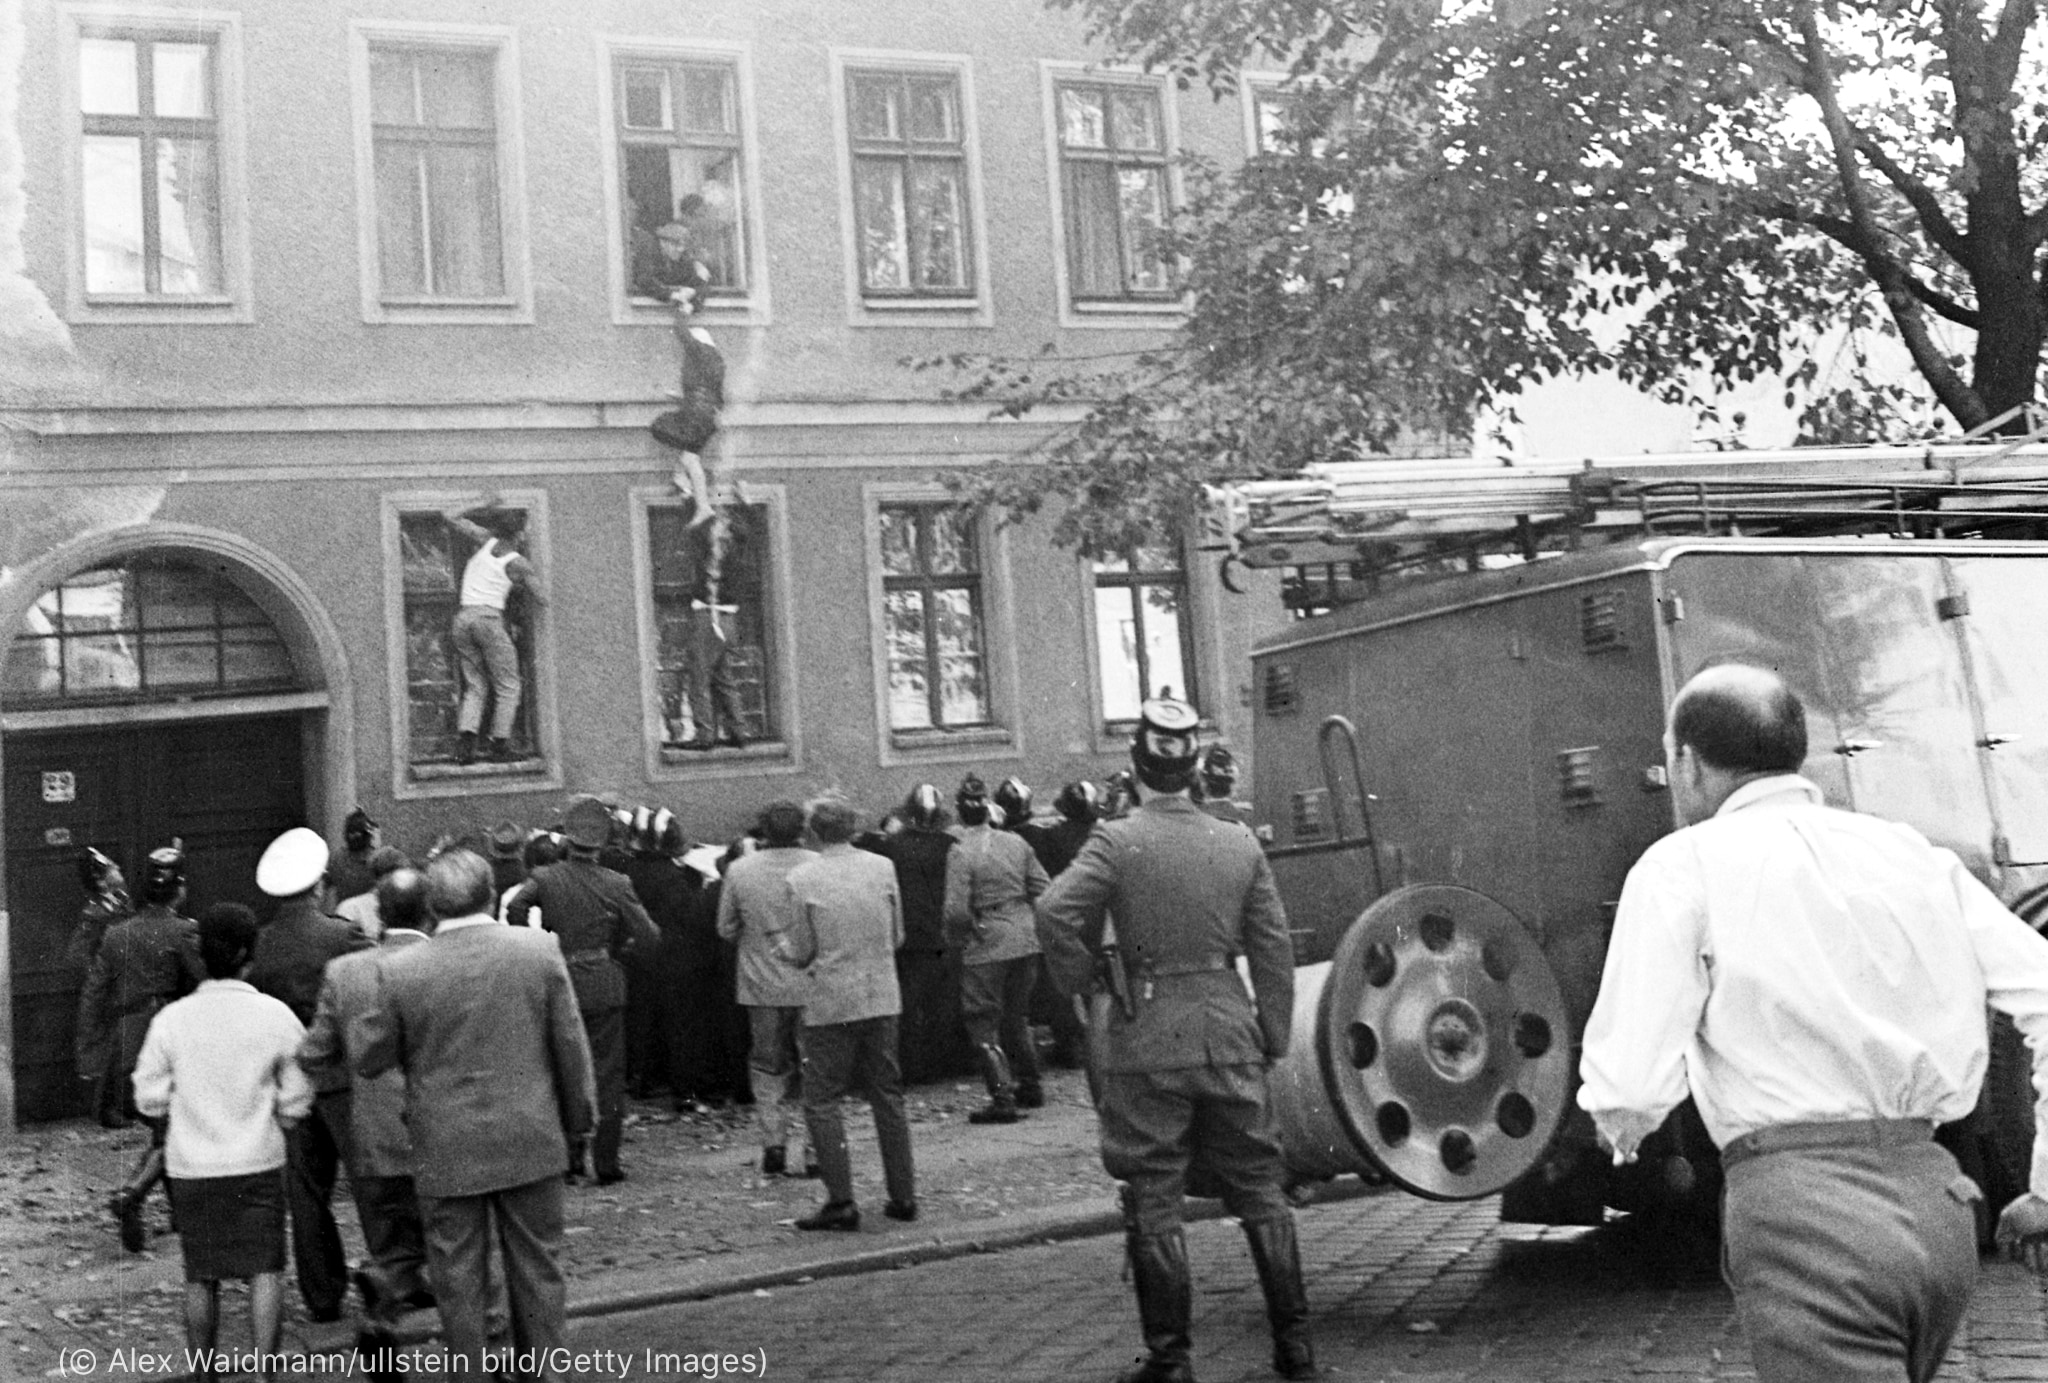 Woman dangling from window, crowd gathered below (© Alex Waidmann/ullstein bild/Getty Images)